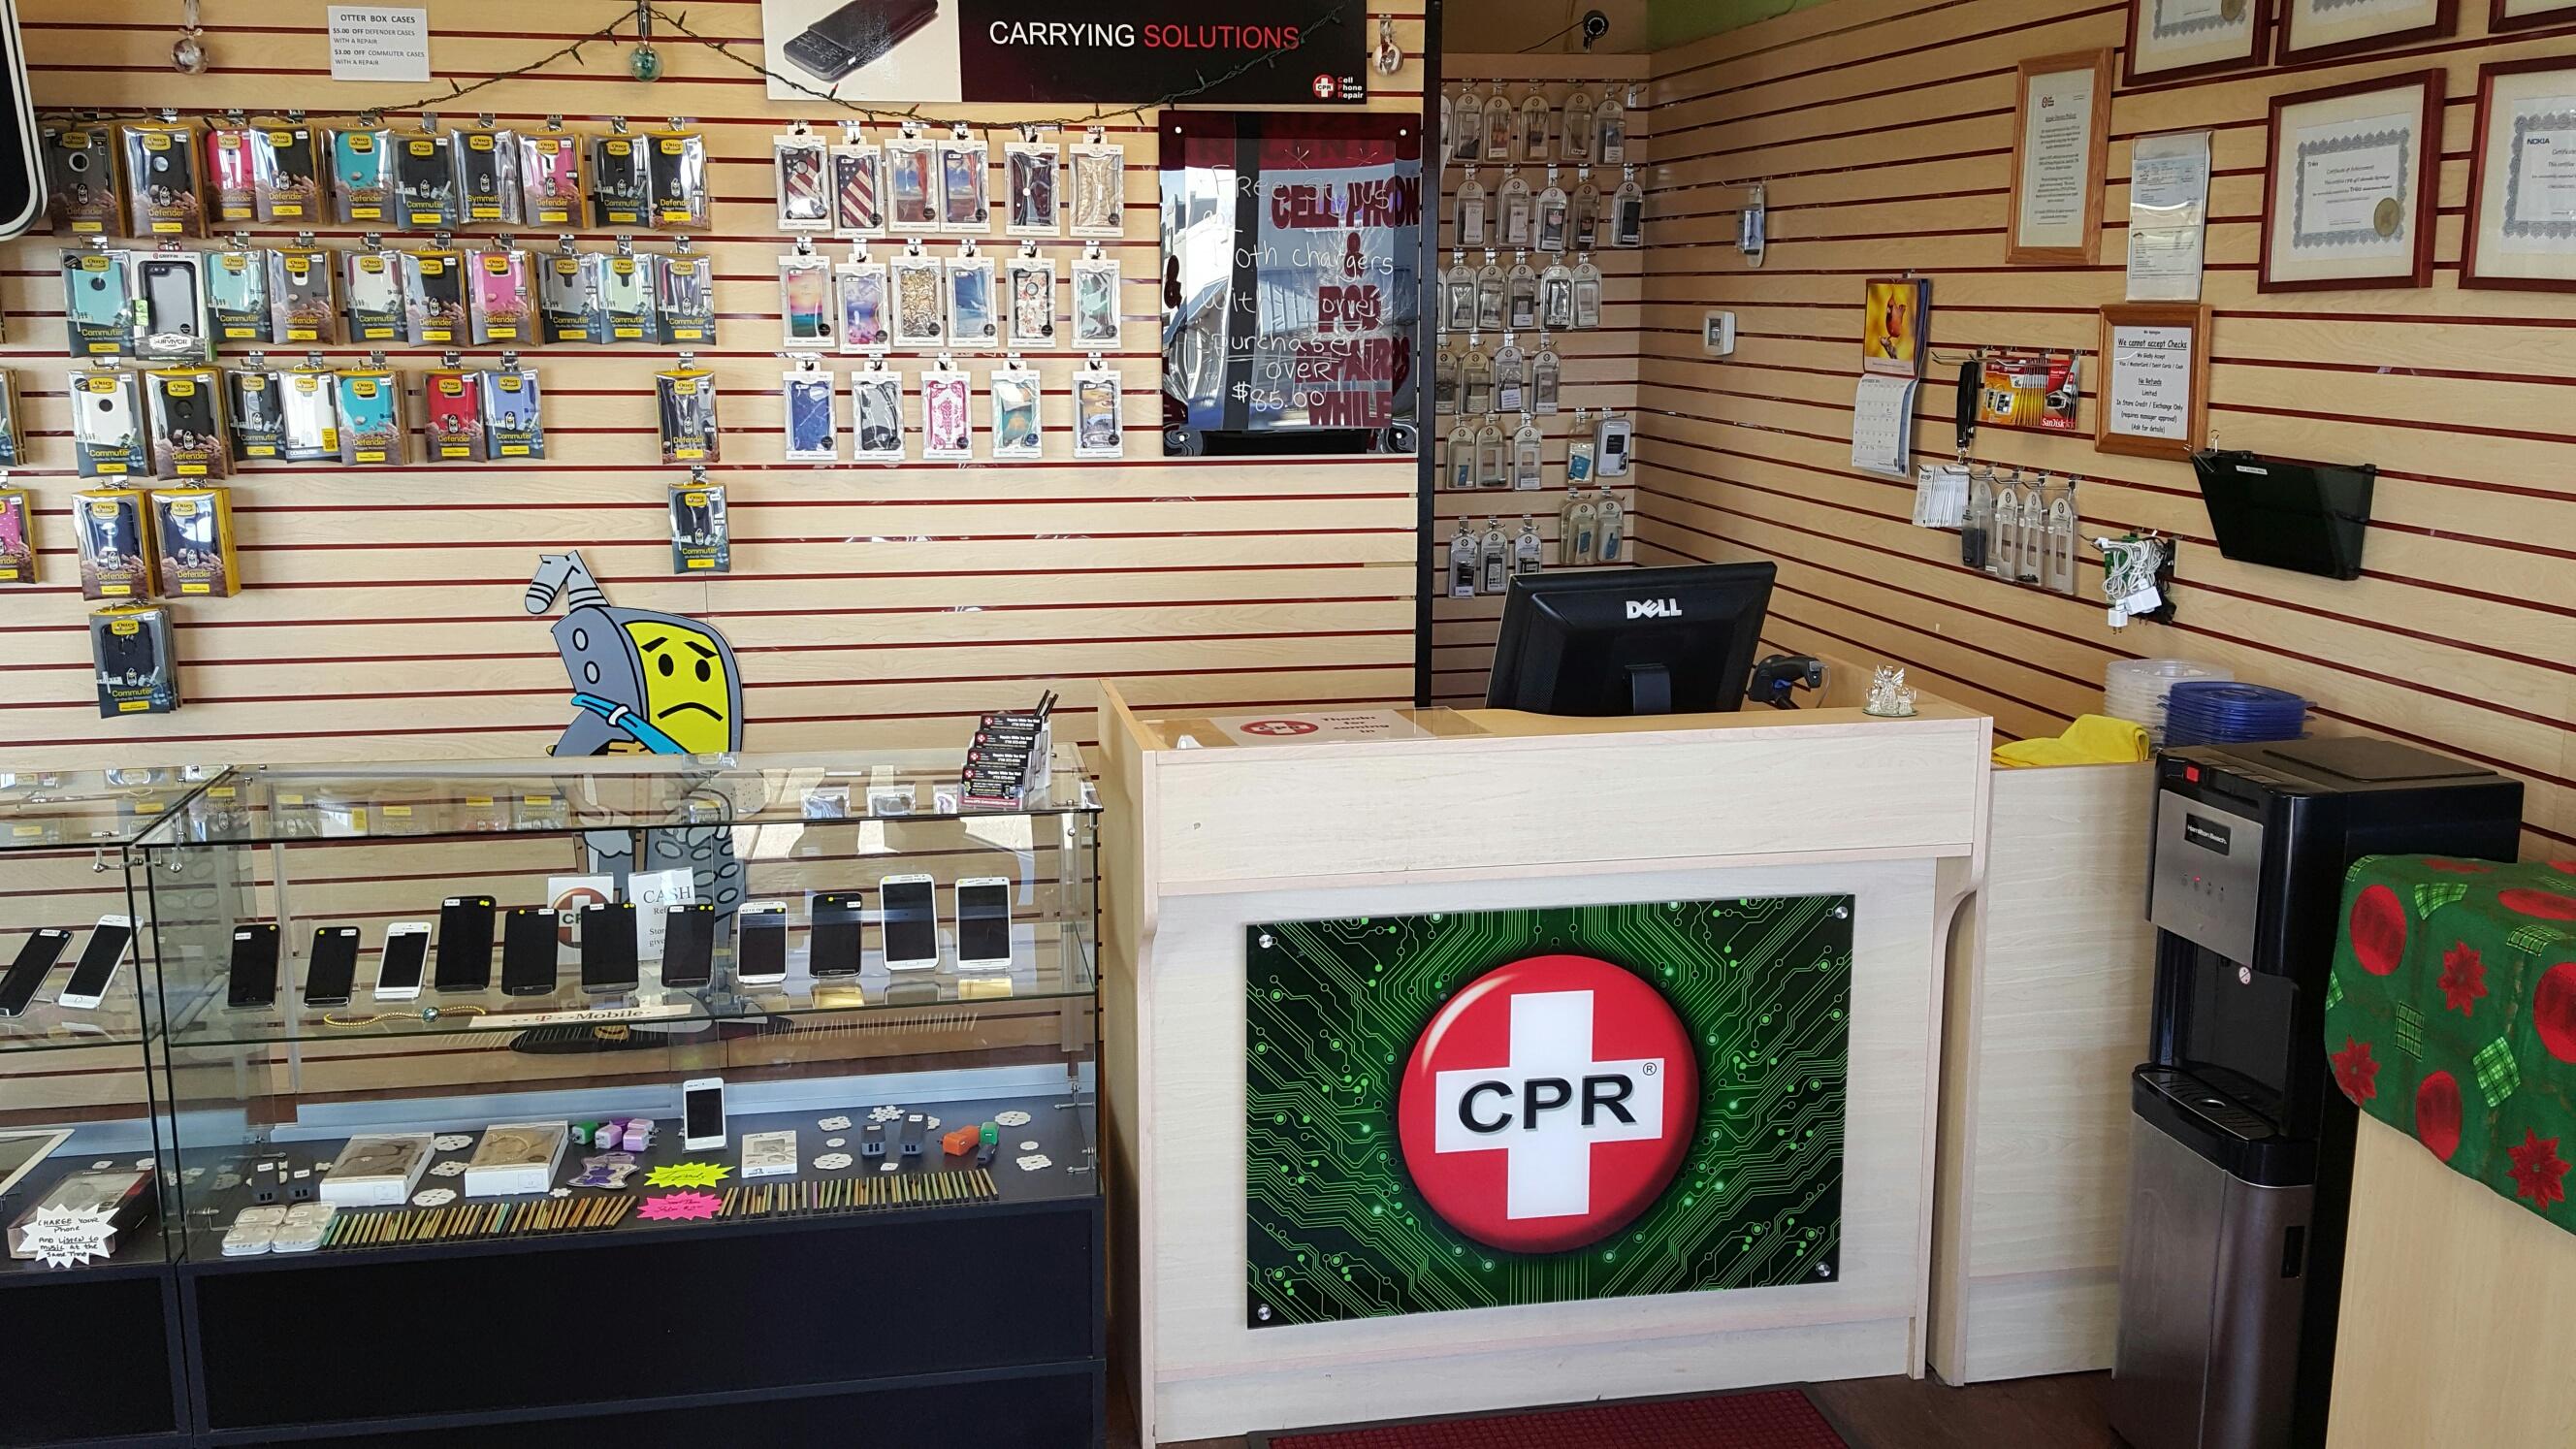 CPR Cell Phone Repair Colorado Springs image 1